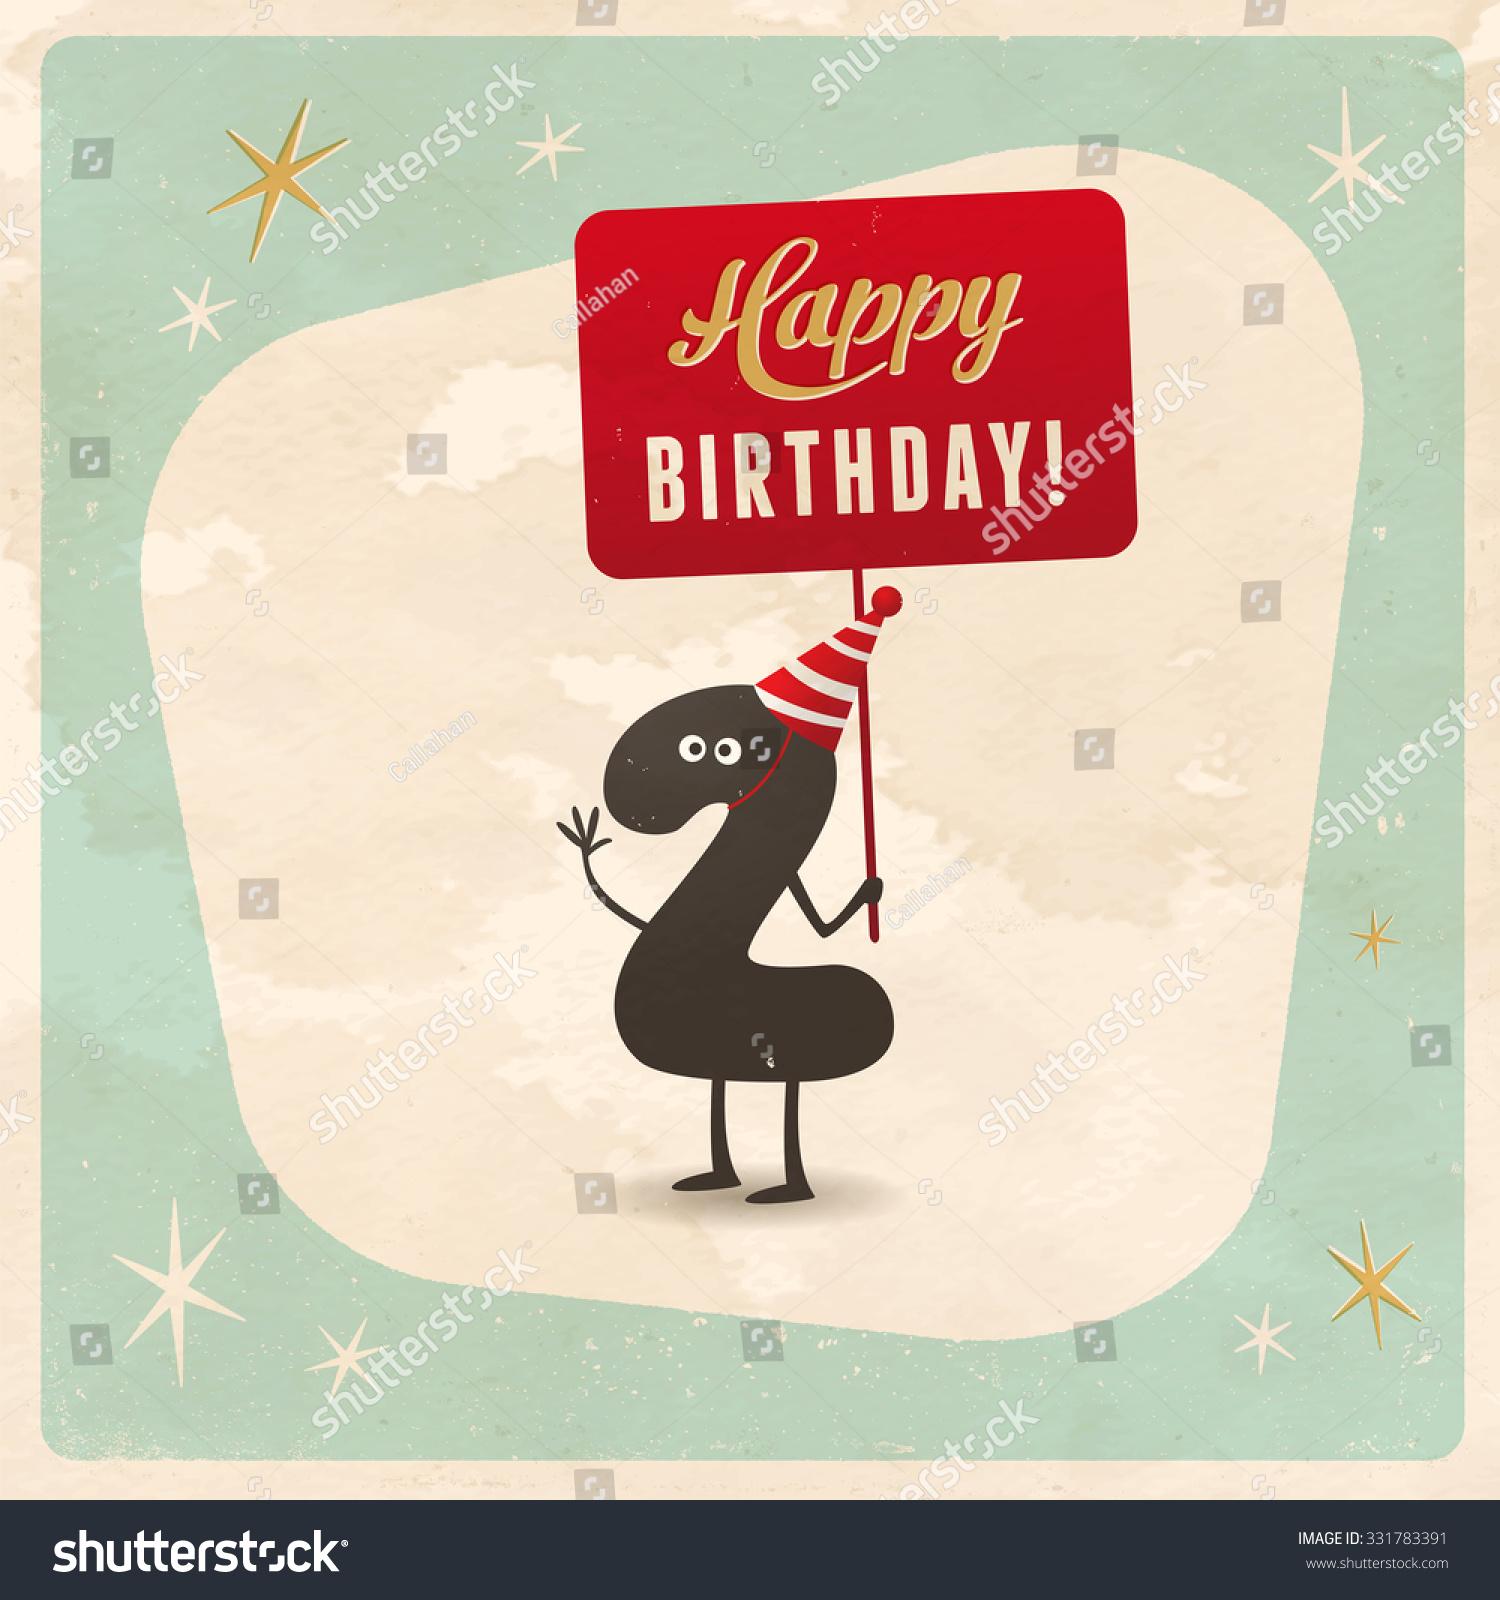 2nd Birthday Card Free Birthday Cards